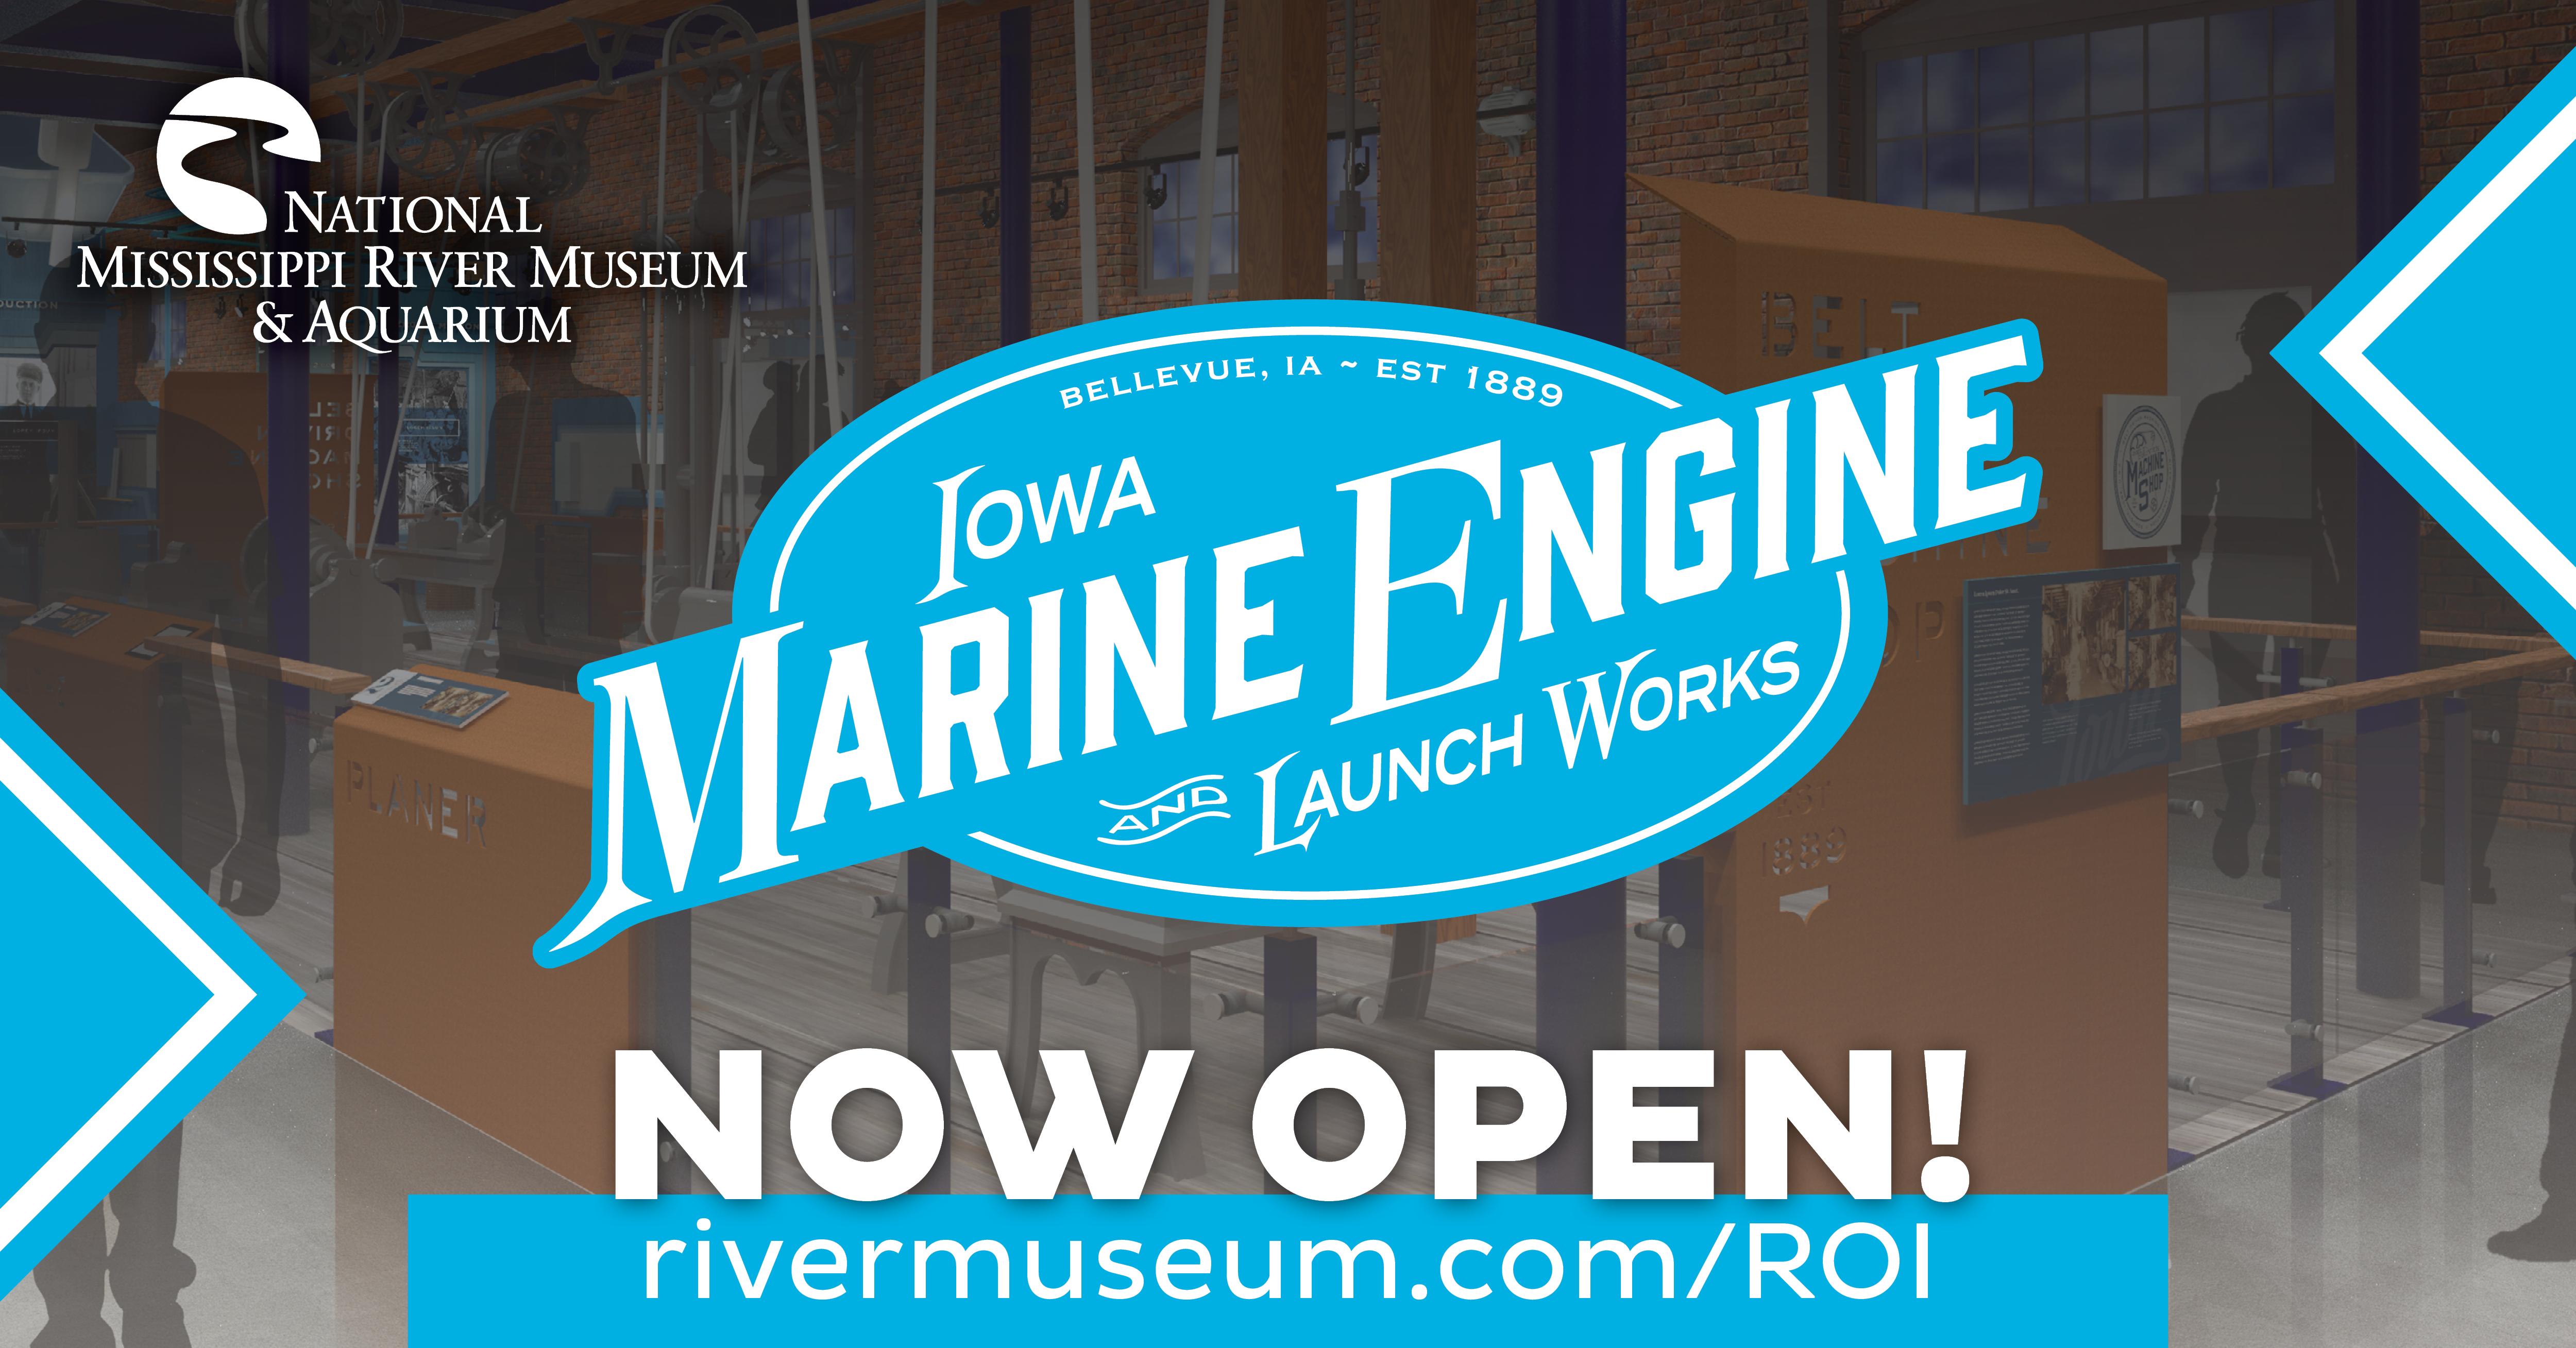 Iowa Marine Engine & Launch Works